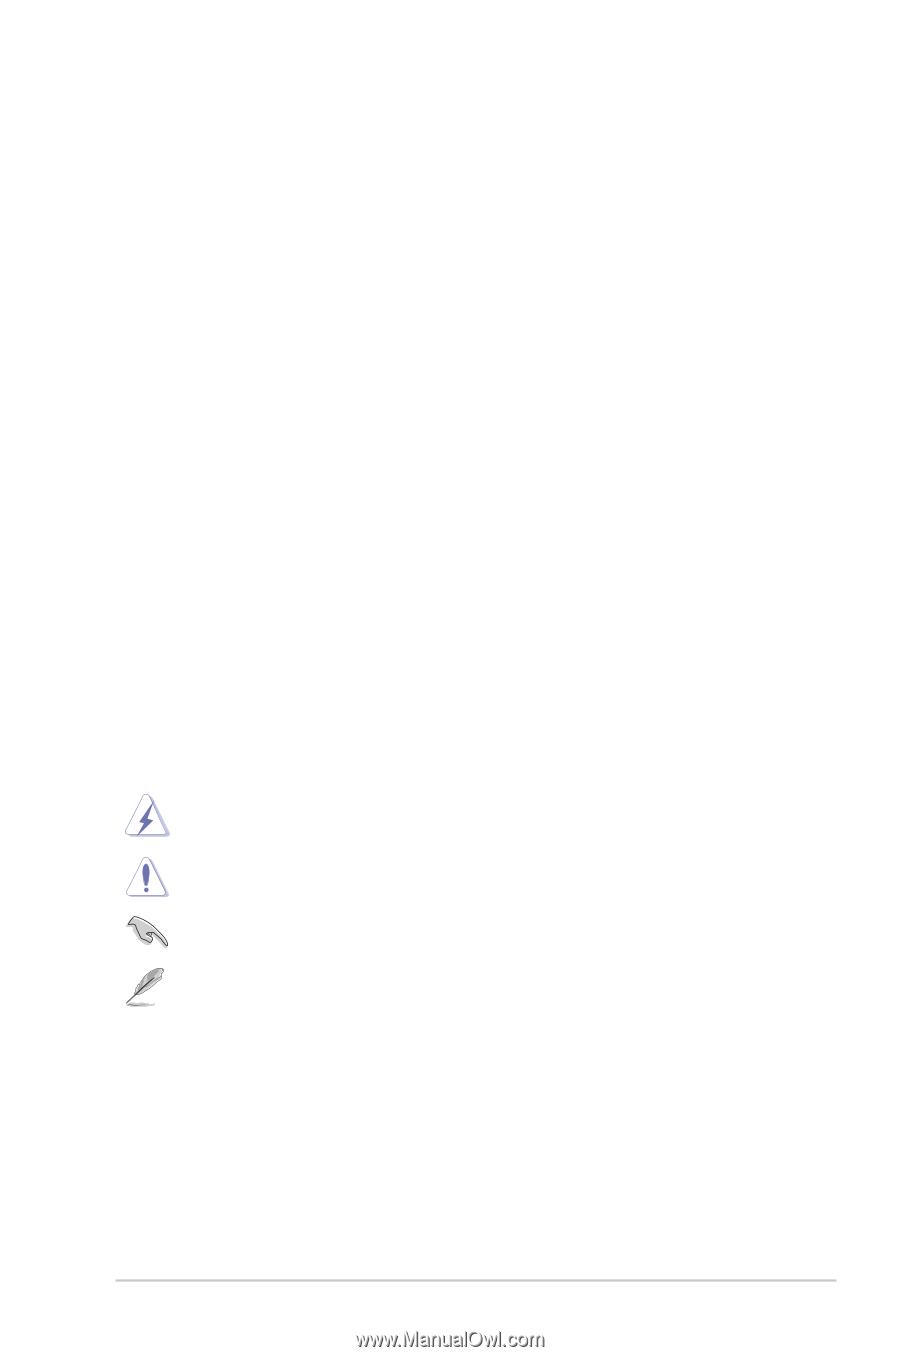 Asus VE248H   User Manual - Page 12